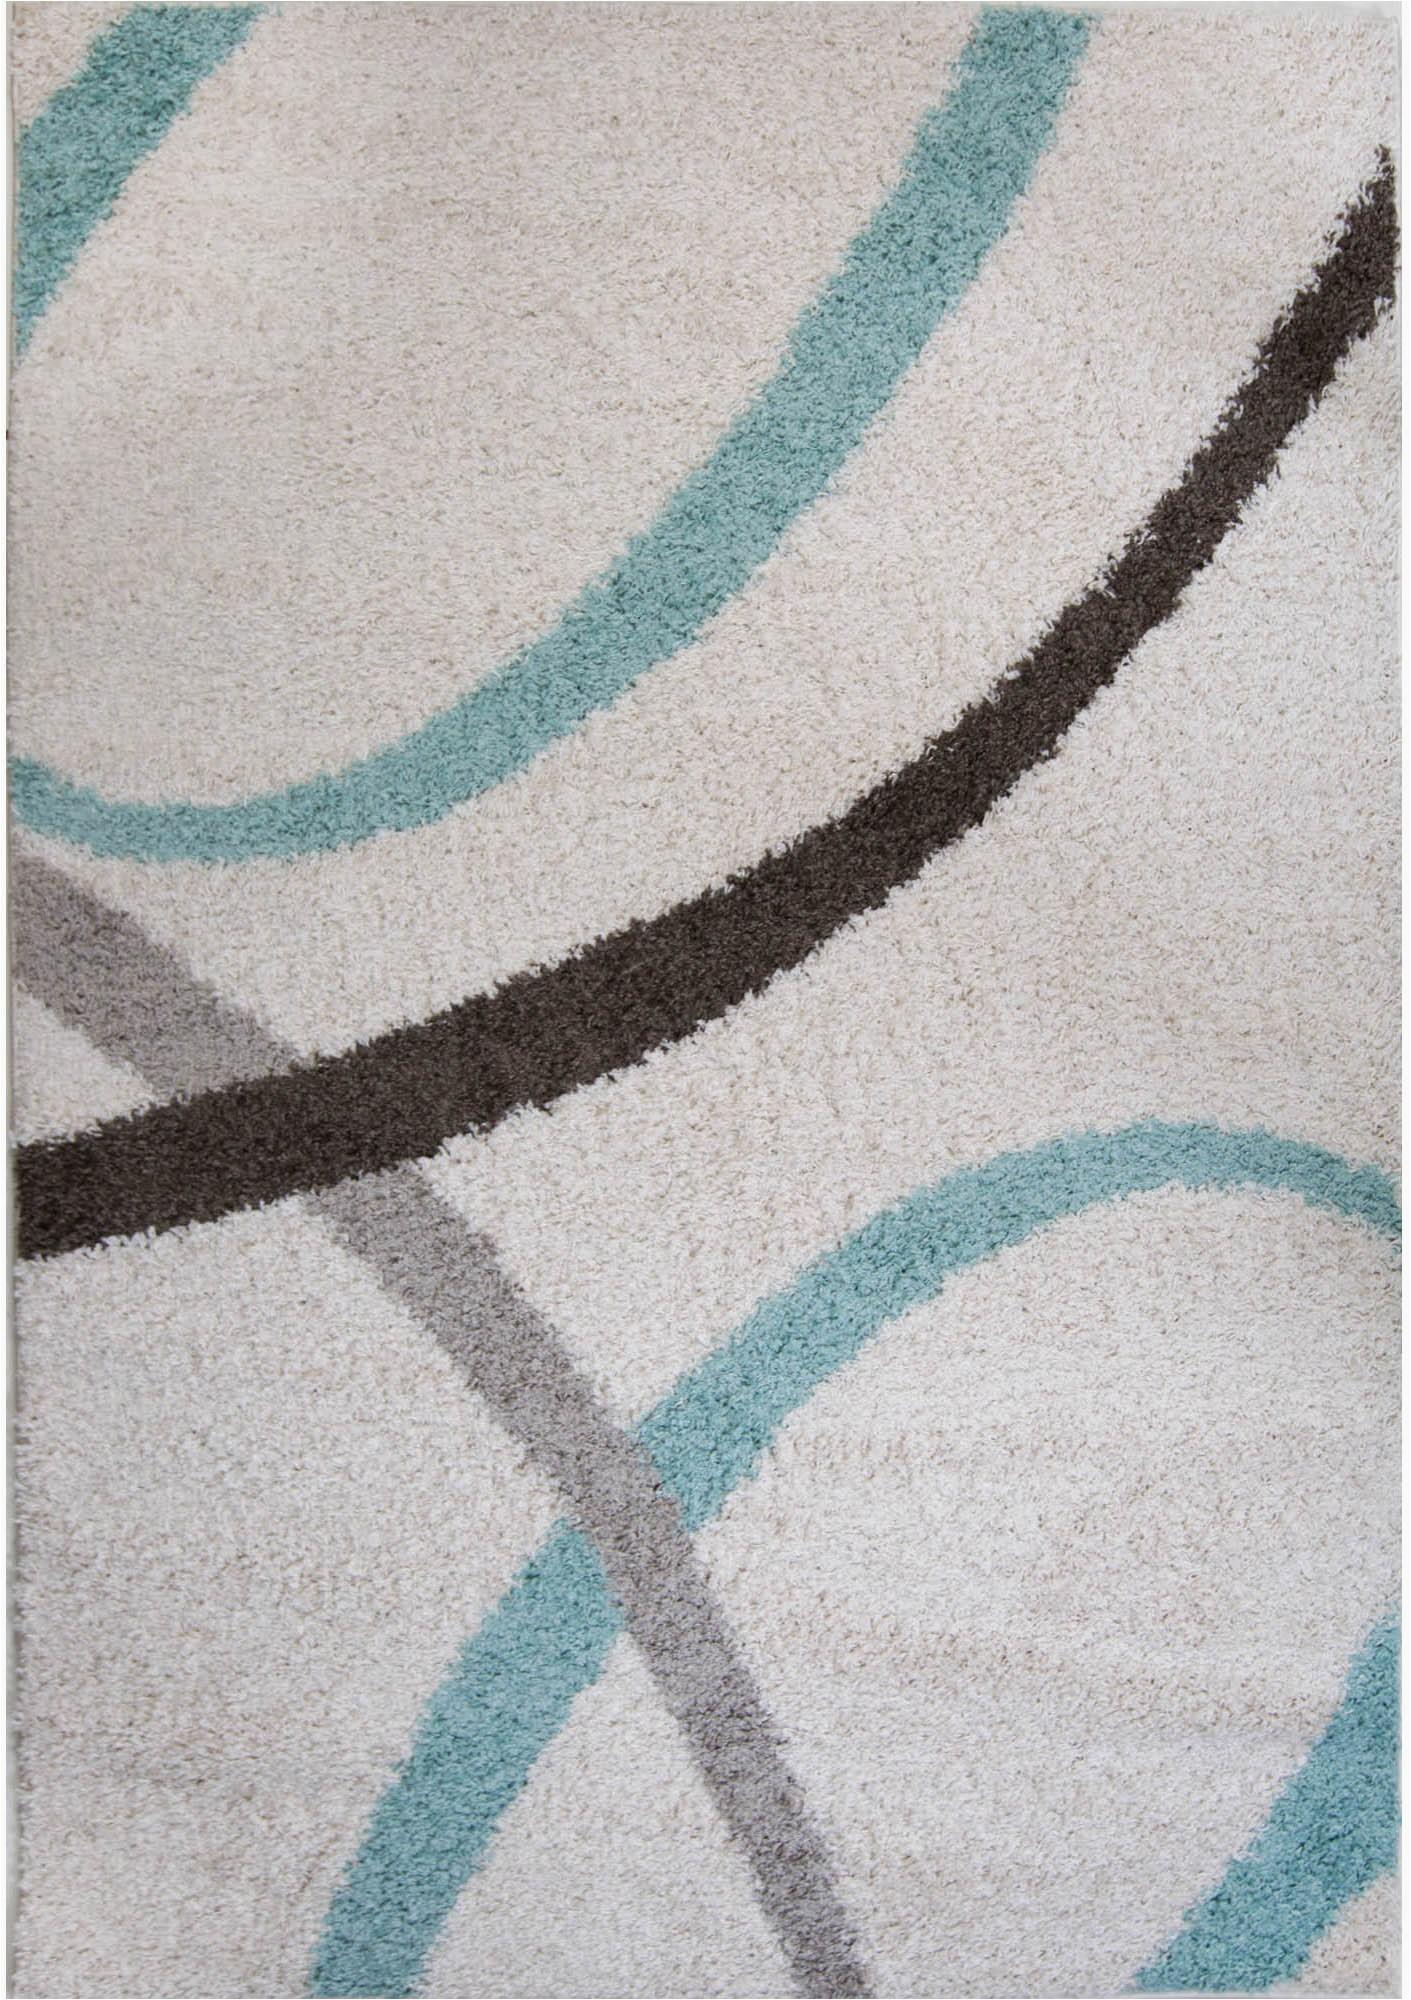 Aqua and White area Rug Nicole Miller Designer area Rug White Aqua Geometric Swirls